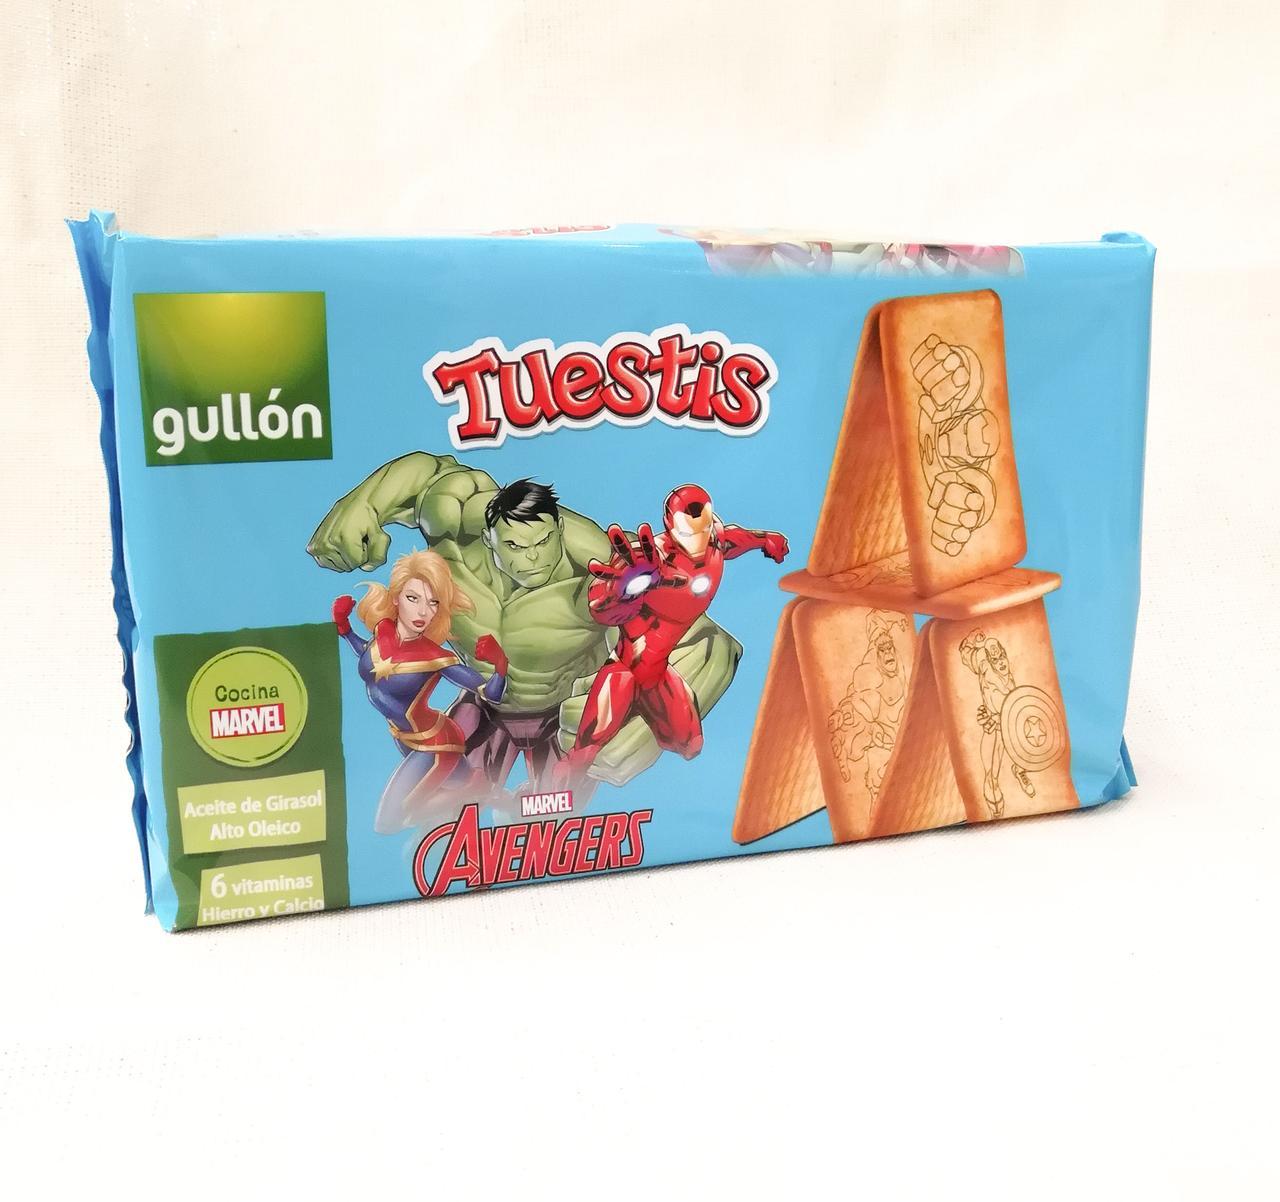 Печенье для детей Gullon Tuestis Avengers 400 gramm